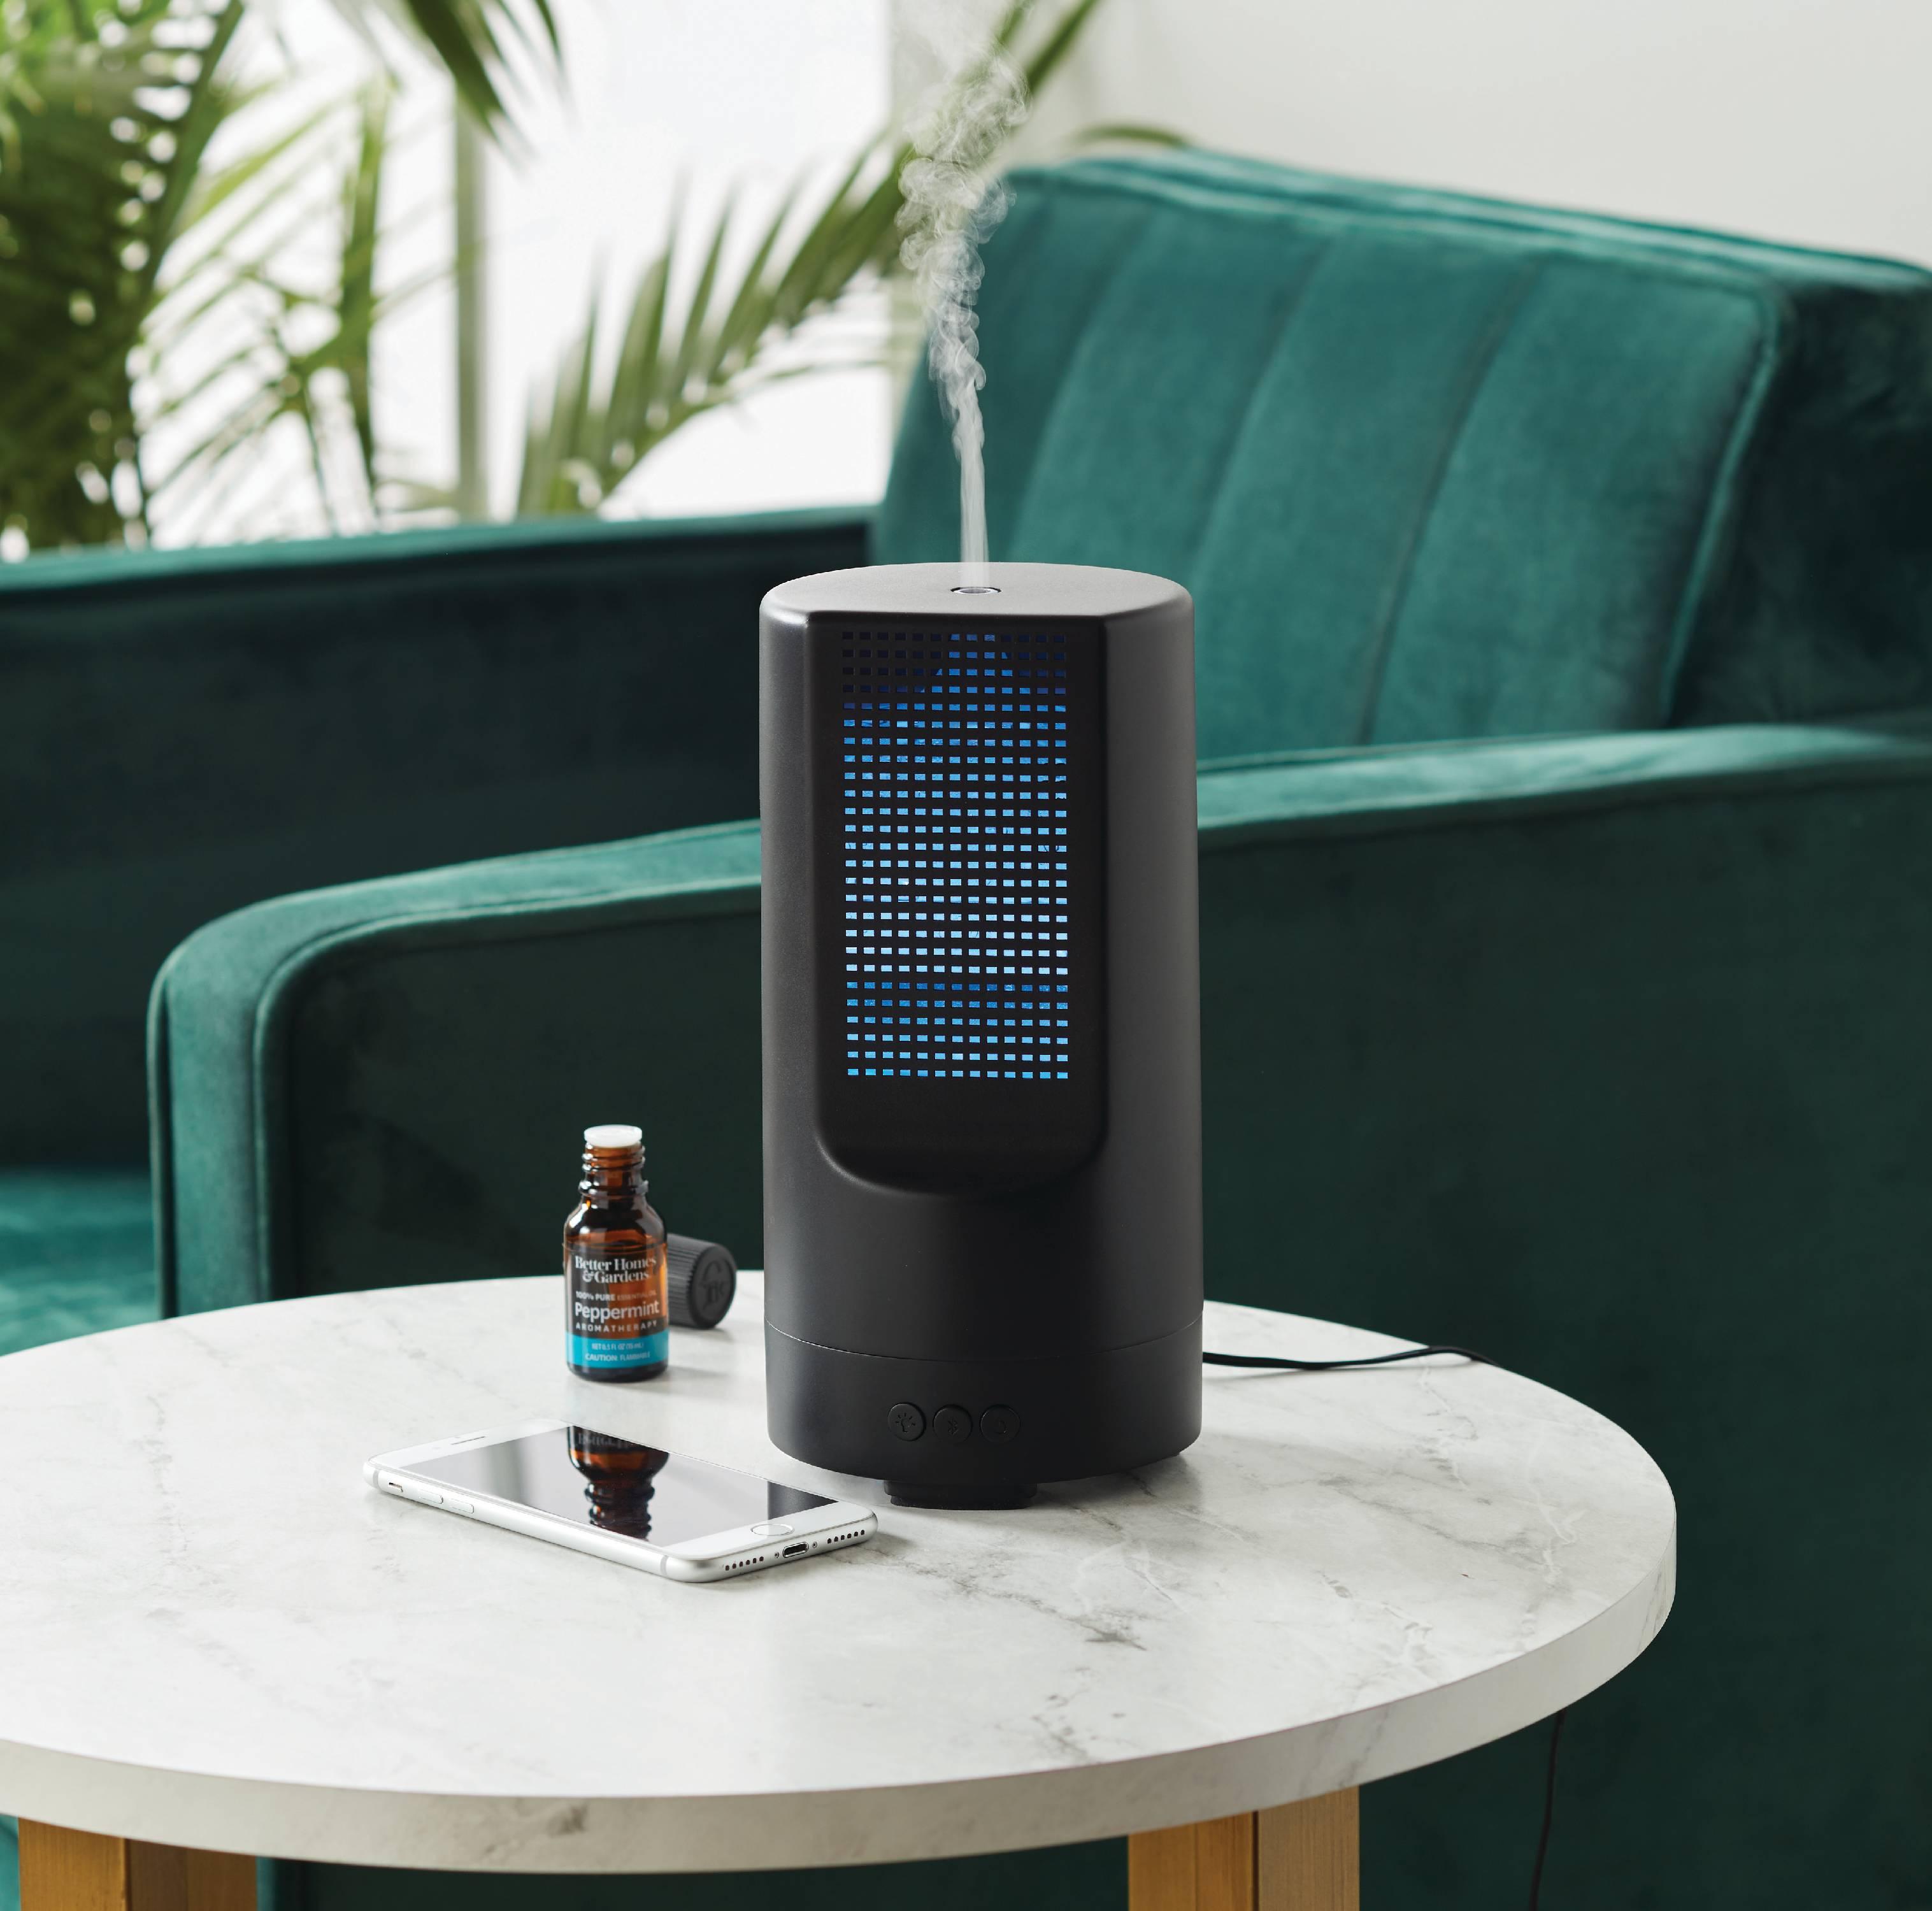 Better Homes & Gardens 220 mL Ultrasonic Aroma Diffuser, Sound Spa Diffuser YMMV $9.87